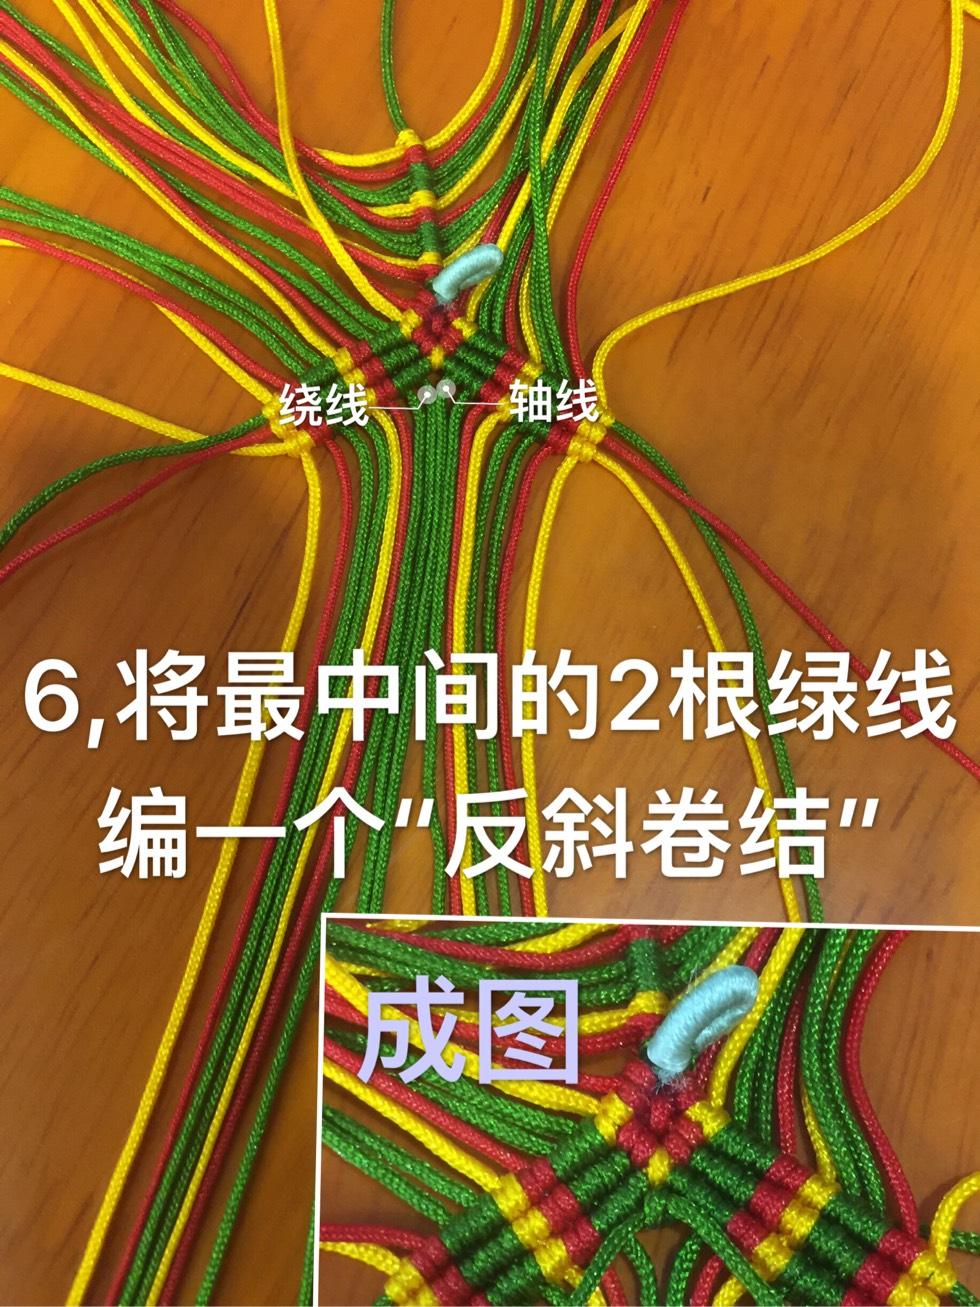 中国结论坛 粽子教程  图文教程区 195725u6tfagx2fq2afwfn